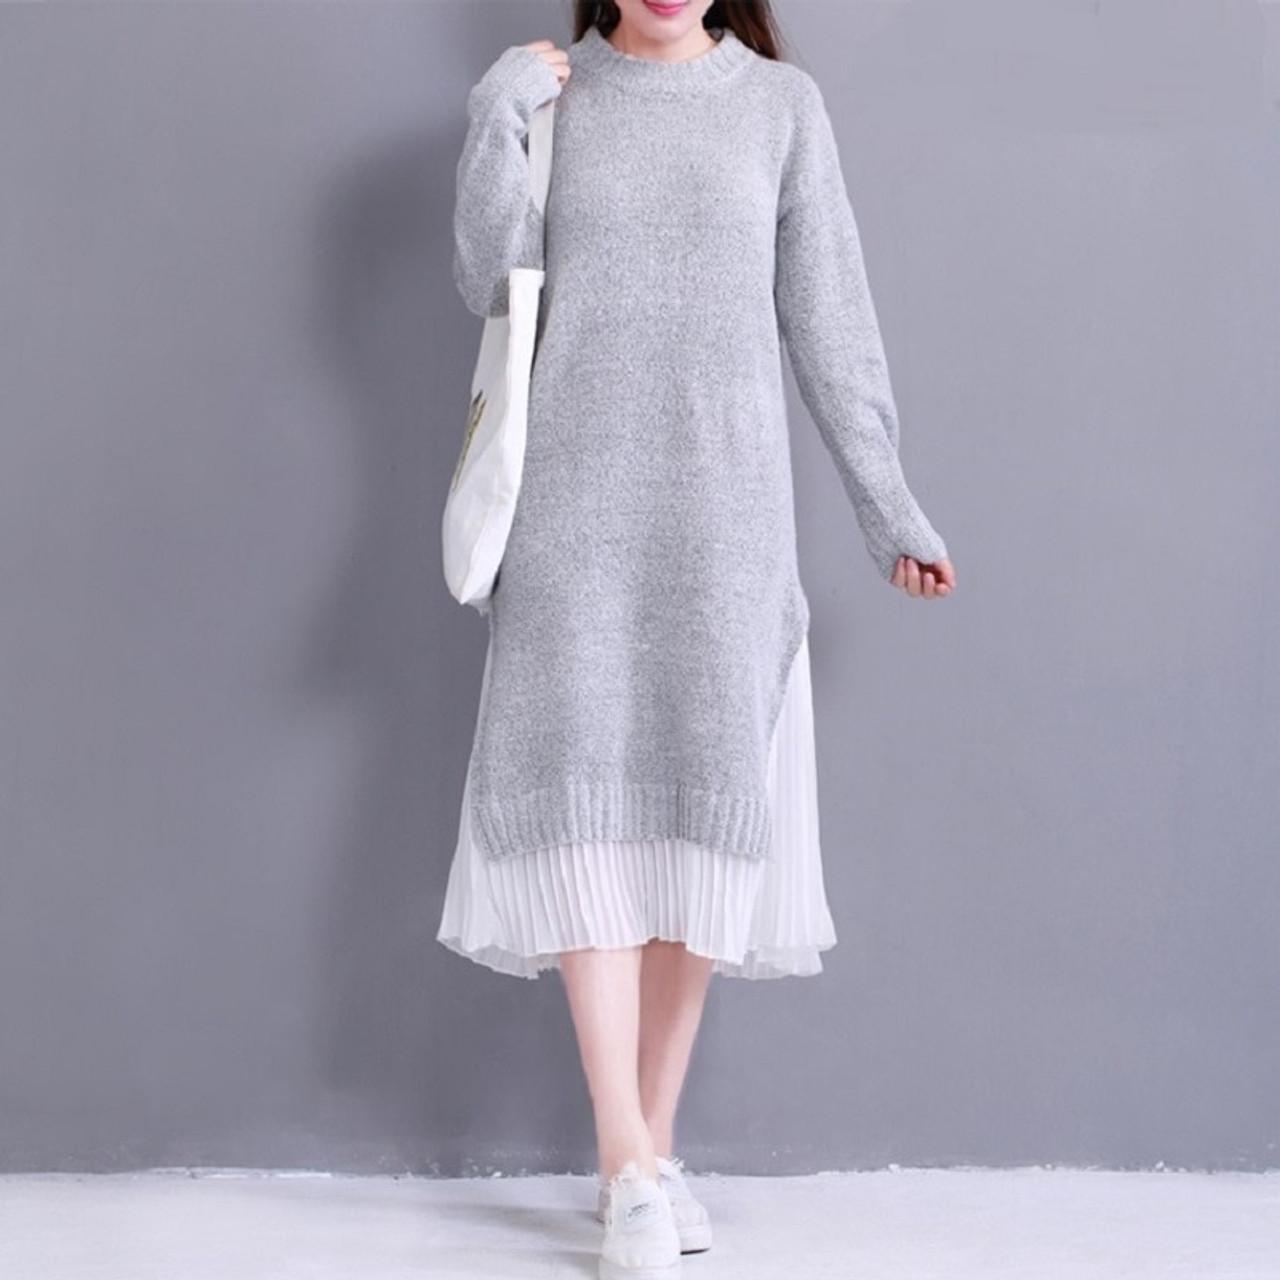 5fc303ac56a ... 2018 Spring Autumn Women Midi Dress Round Neck Knitted Chiffon  Patchwork Sweater Dress Casual Elegant Long ...